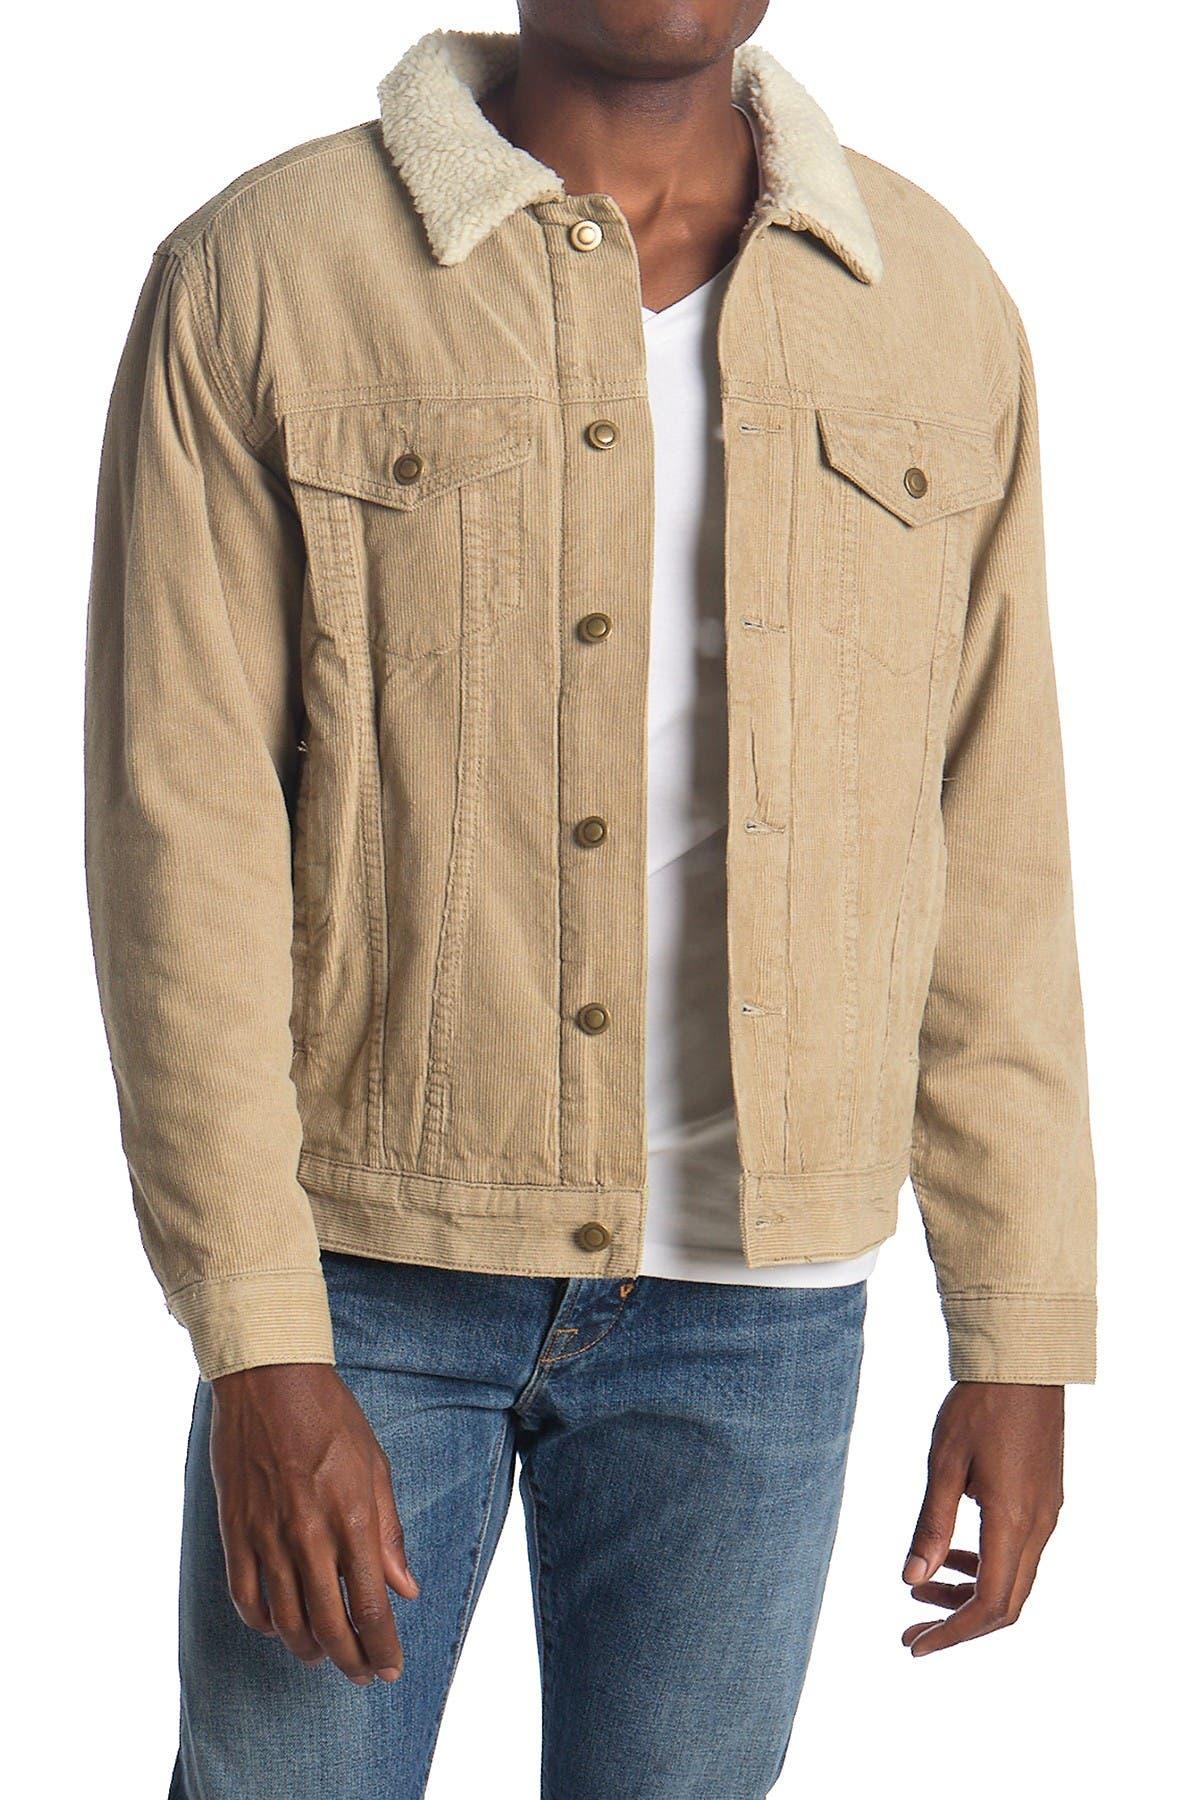 Image of COASTAORO Corduroy & Faux Shearling Trucker Jacket